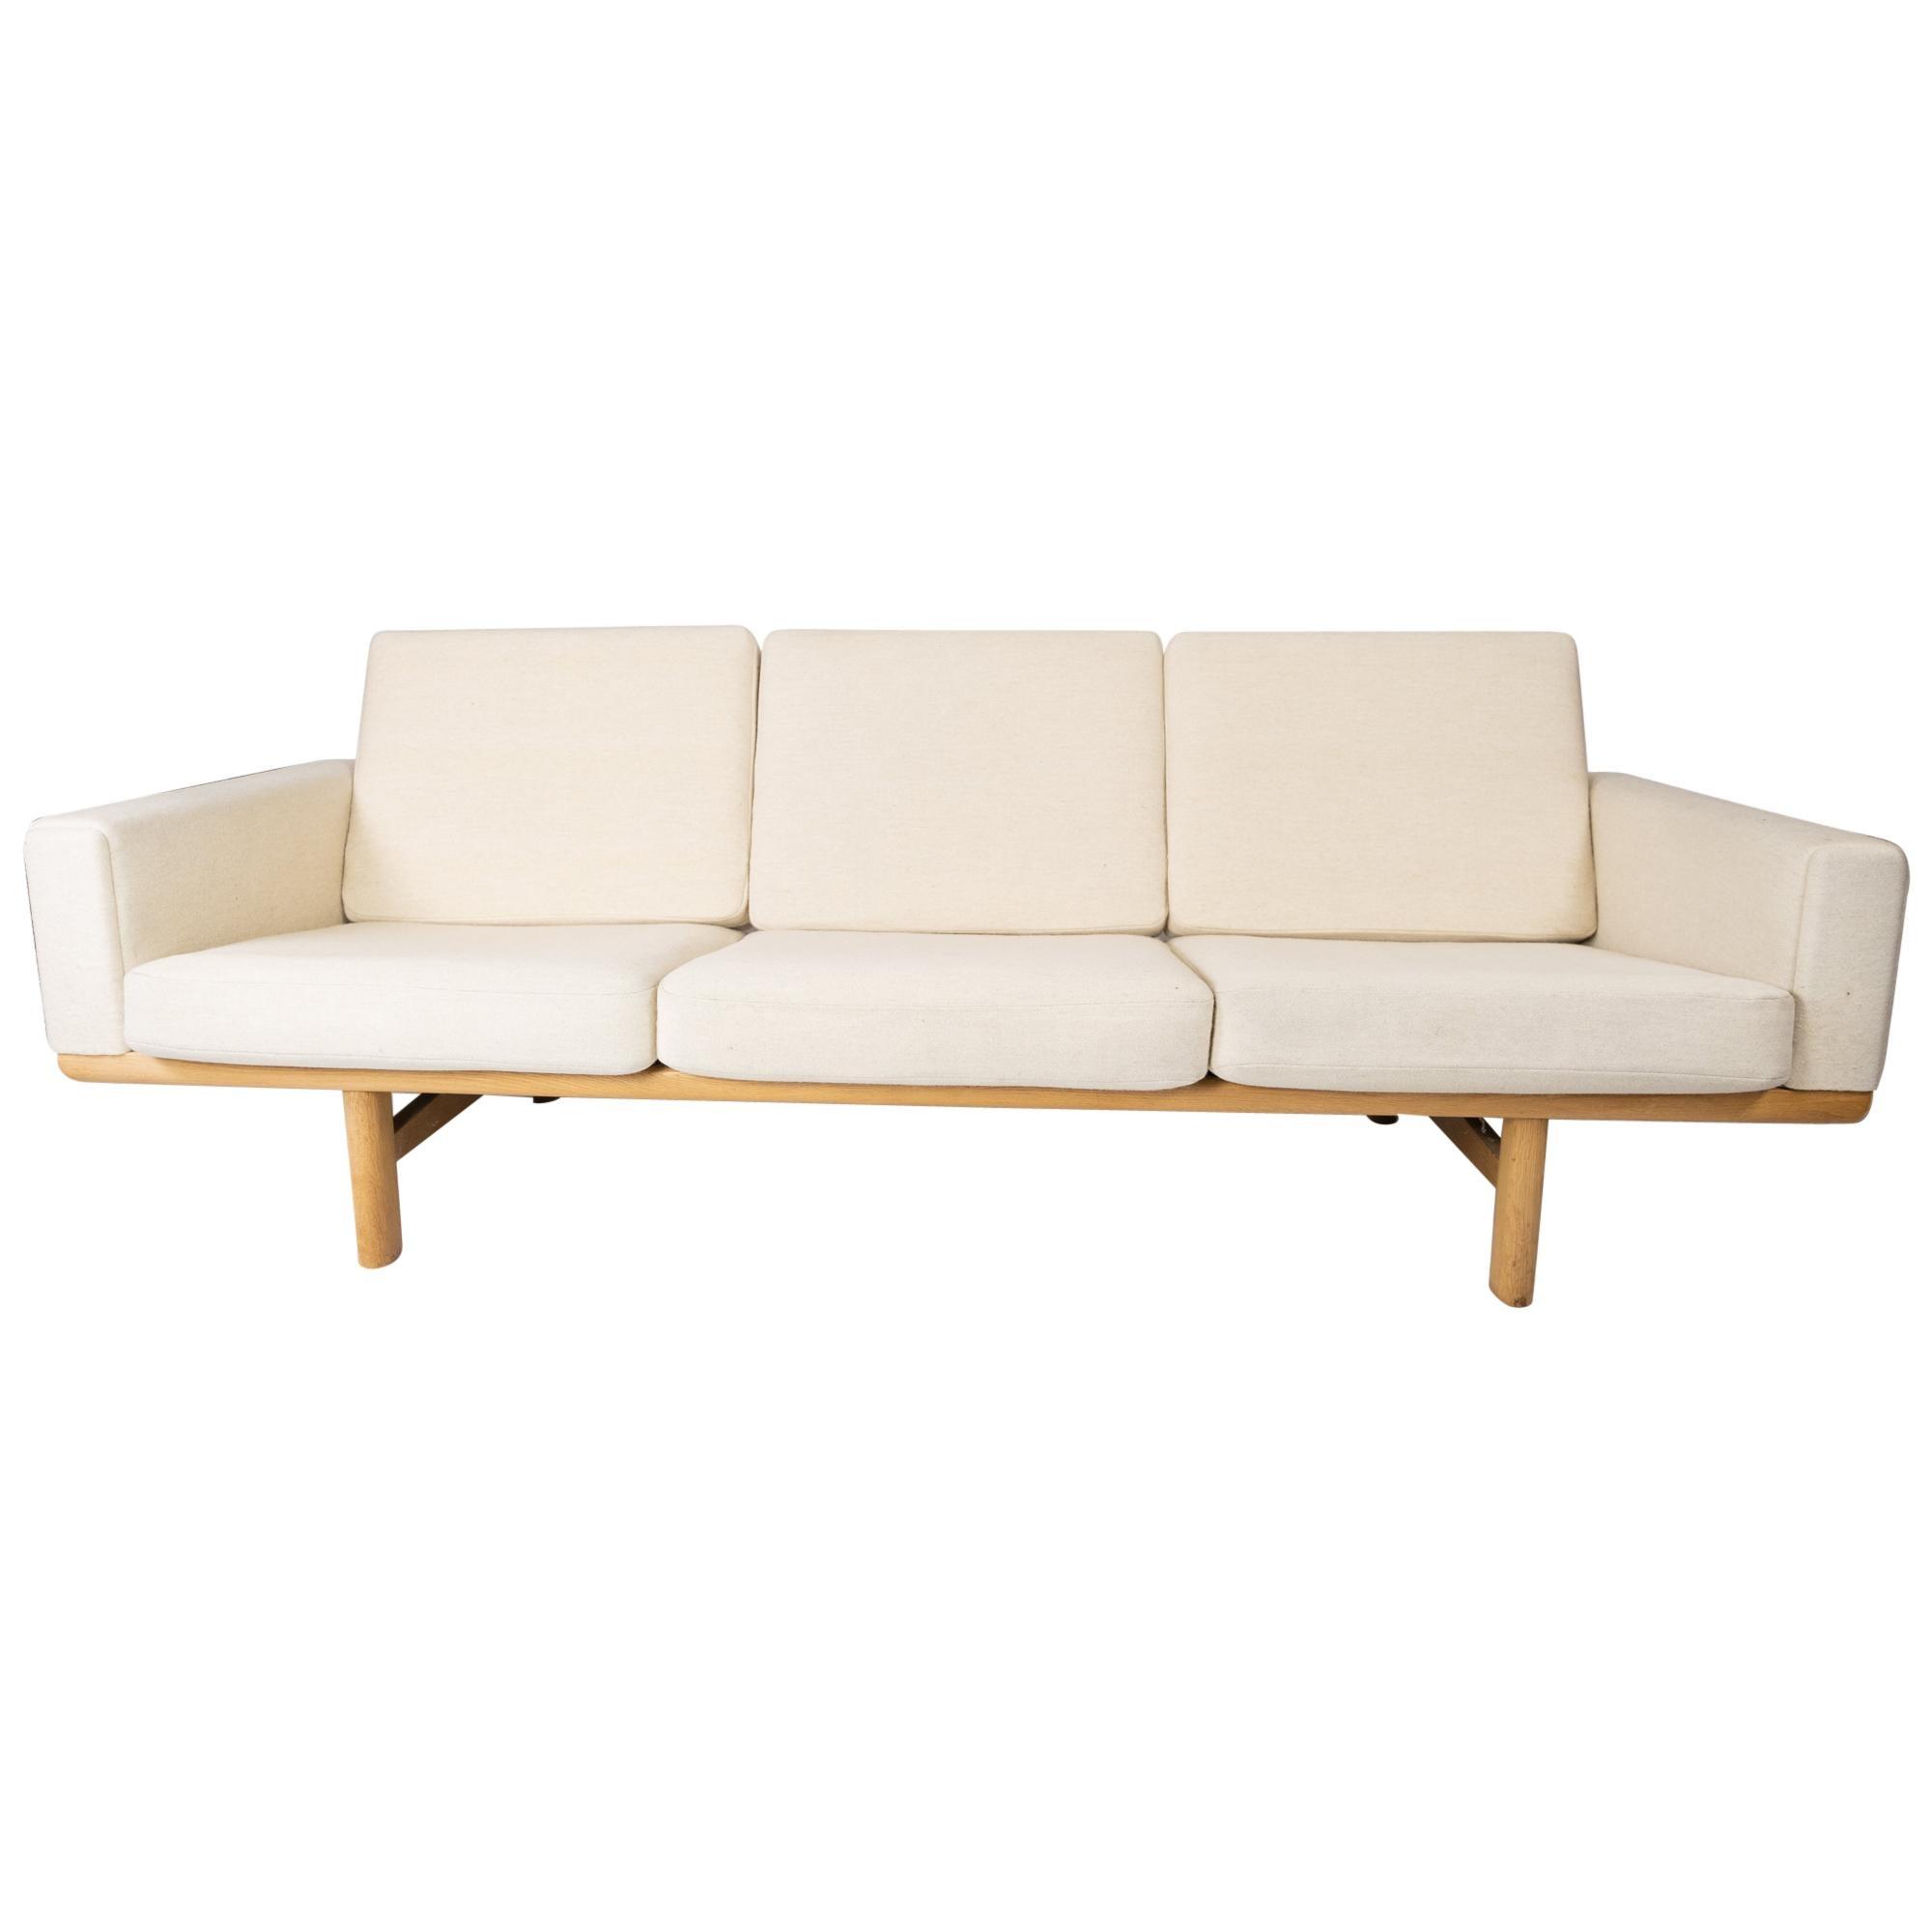 Three-Seat Sofa, Model GE-236/3, Designed by Hans J. Wegner, 1960s